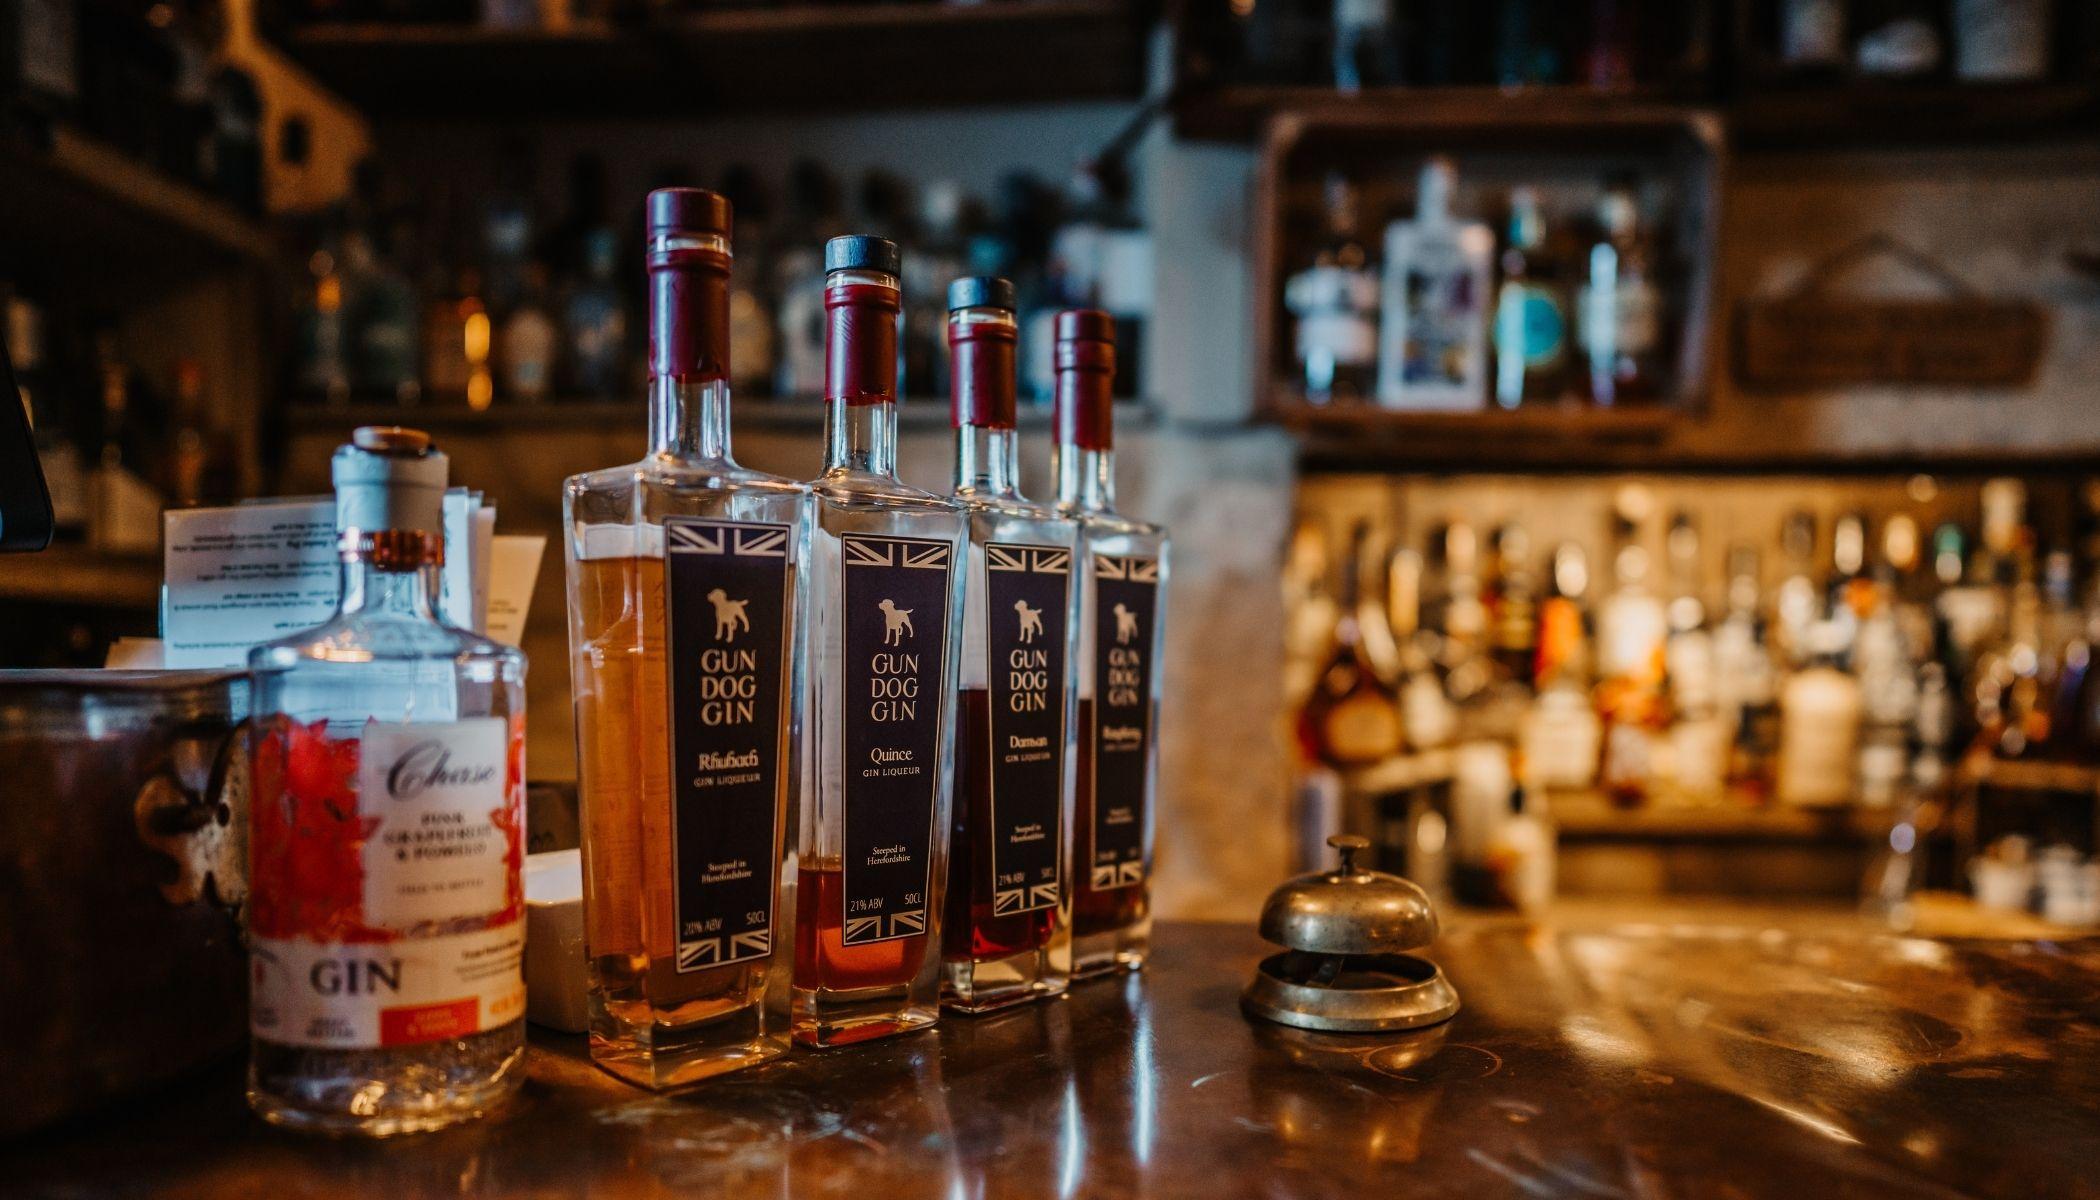 Gin bar in Bradford on Avon